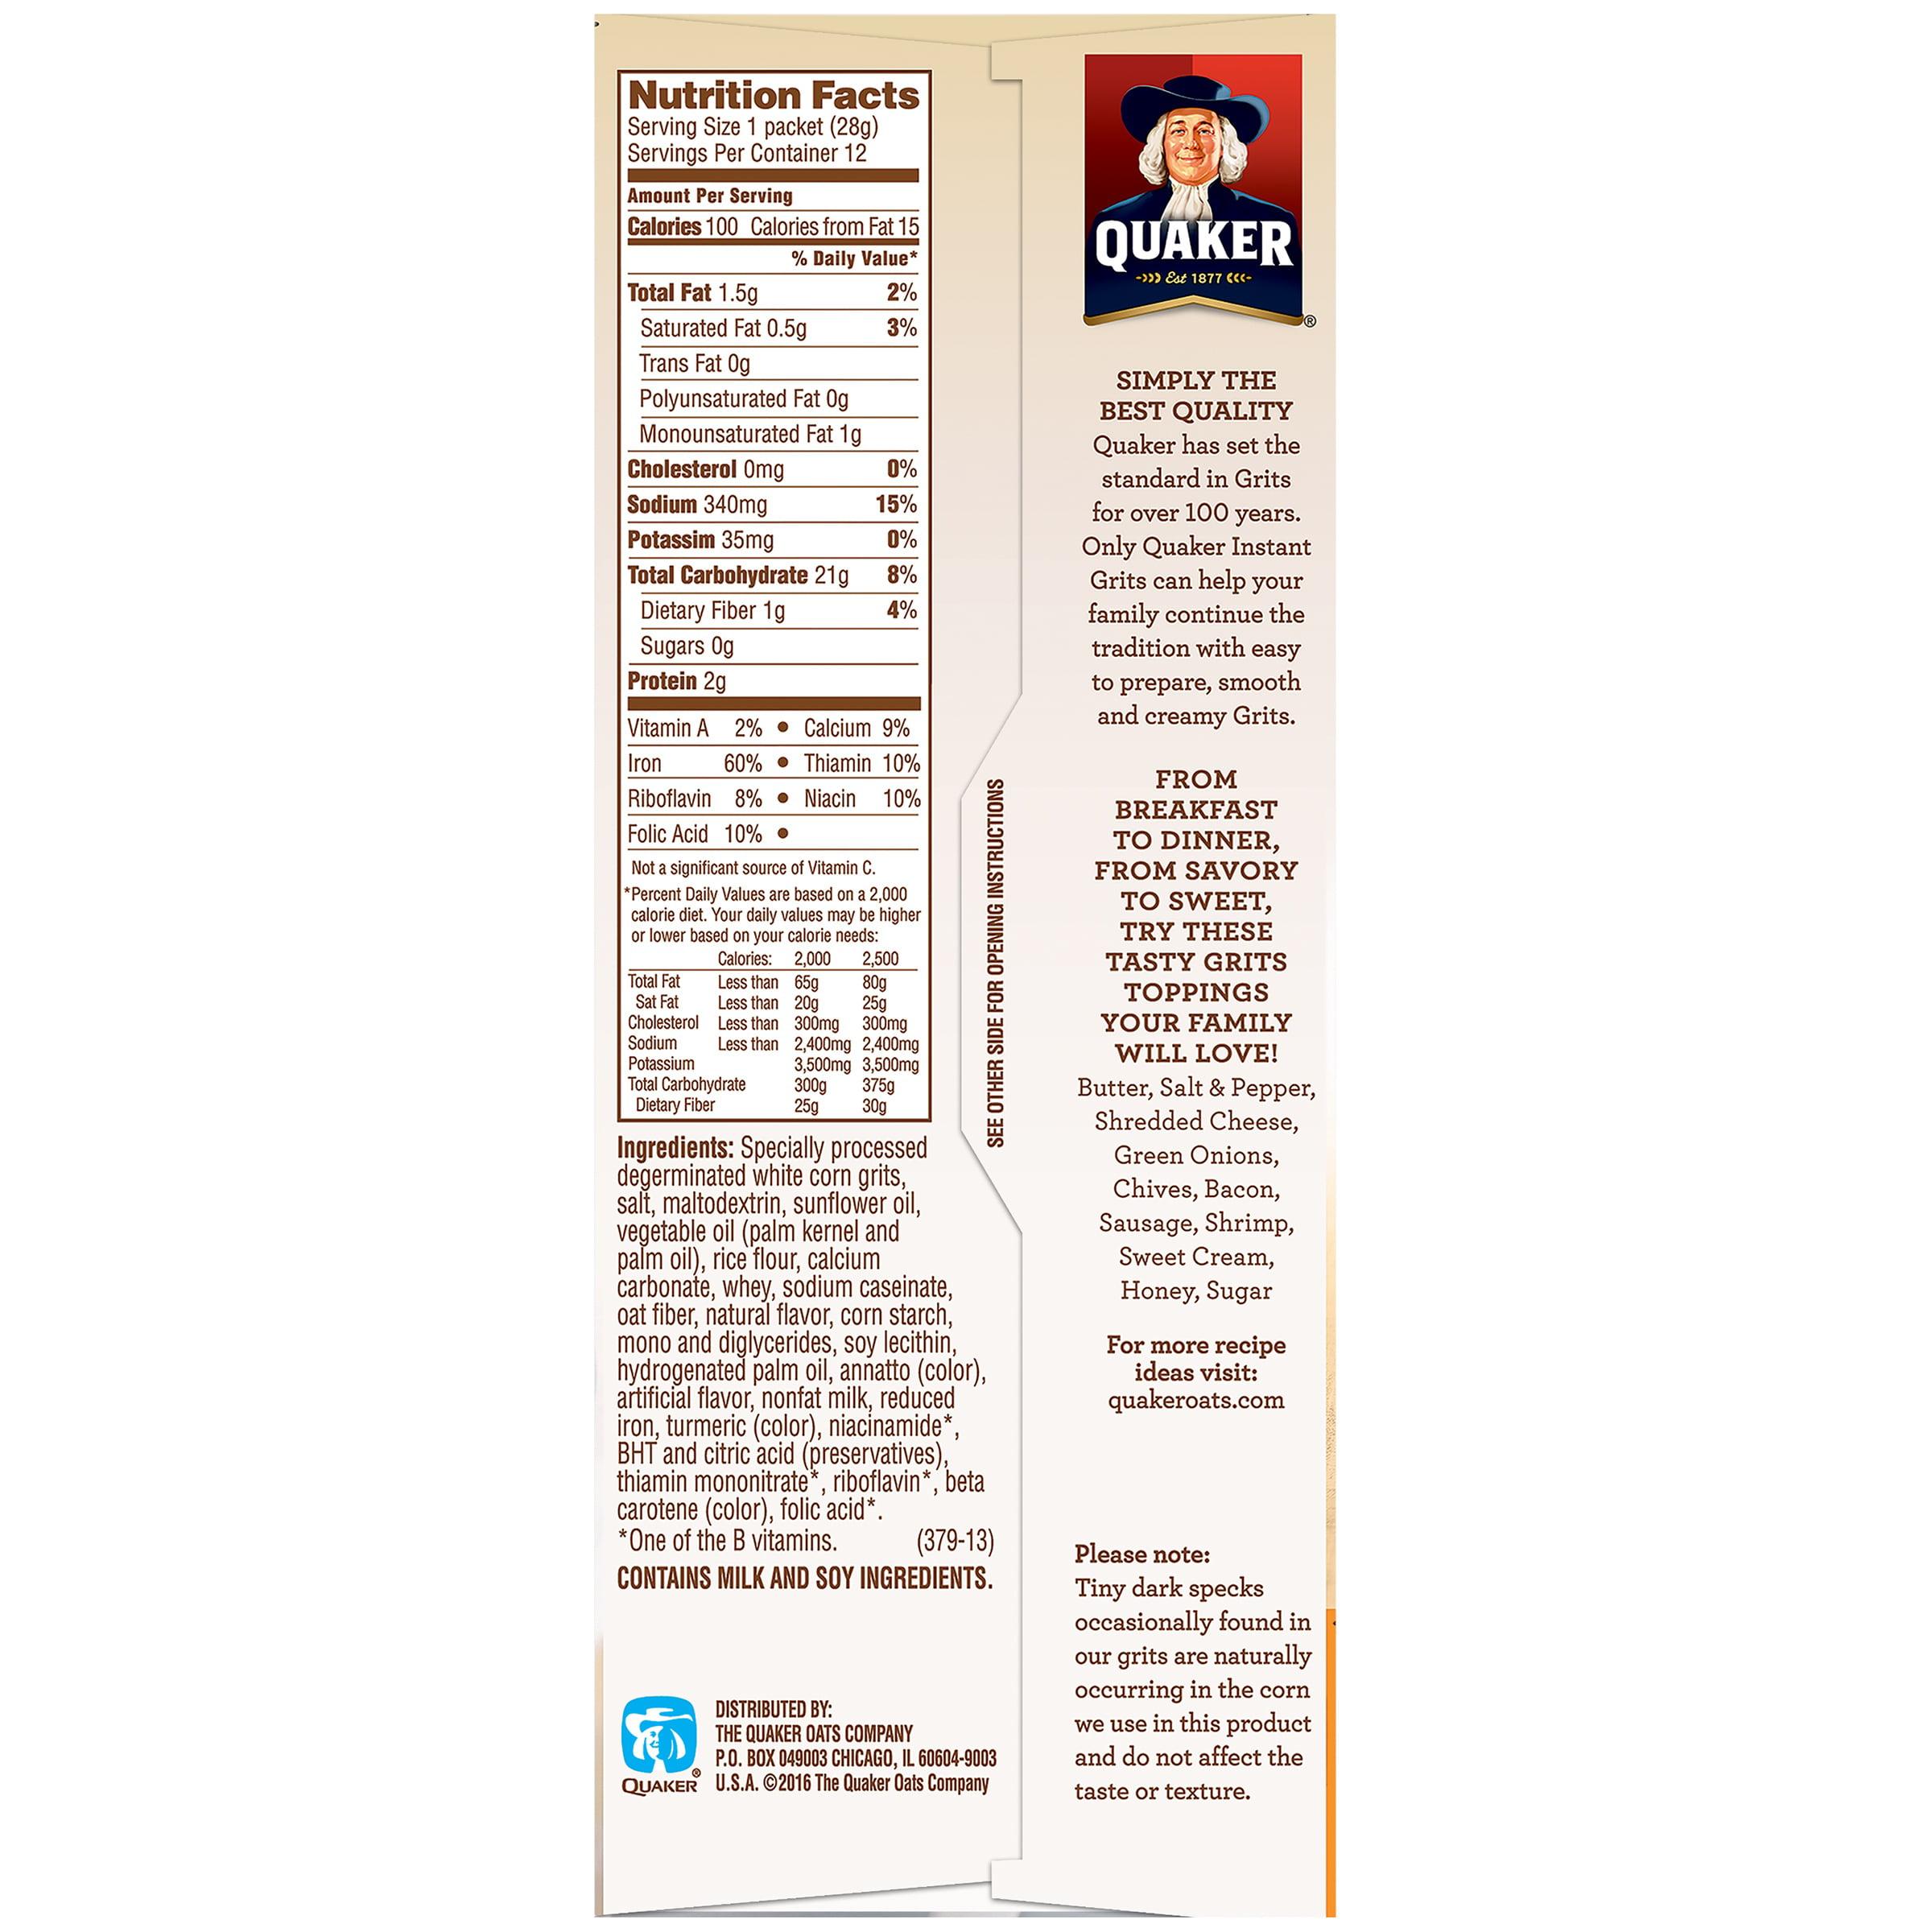 (4 Pack) Quaker Instant Grits, Butter, 1 oz Packets, 12 Count - Walmart.com